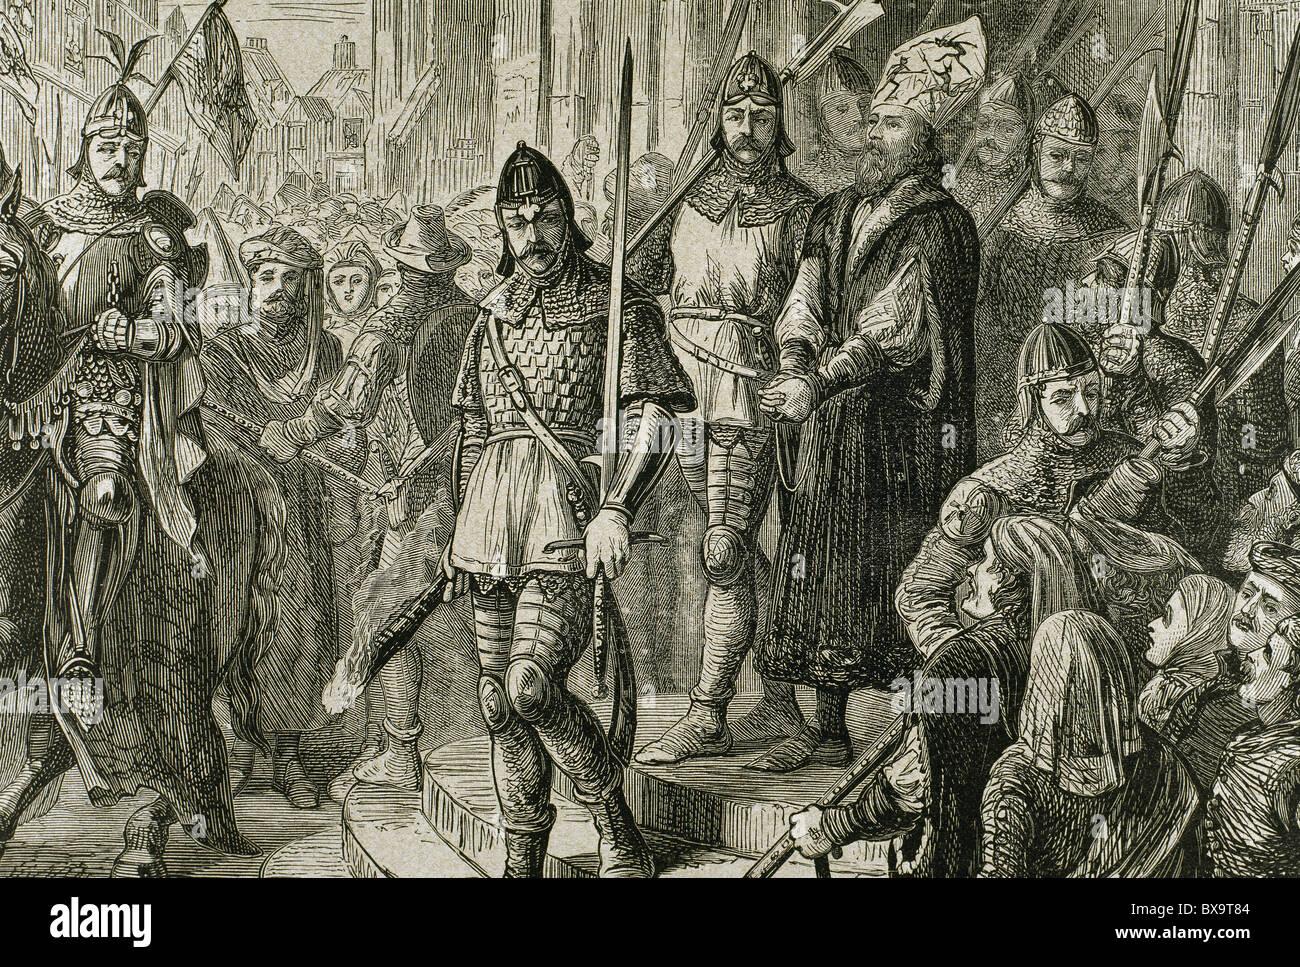 Jerome of Prague (1360-1416). Bohemian heretic. - Stock Image